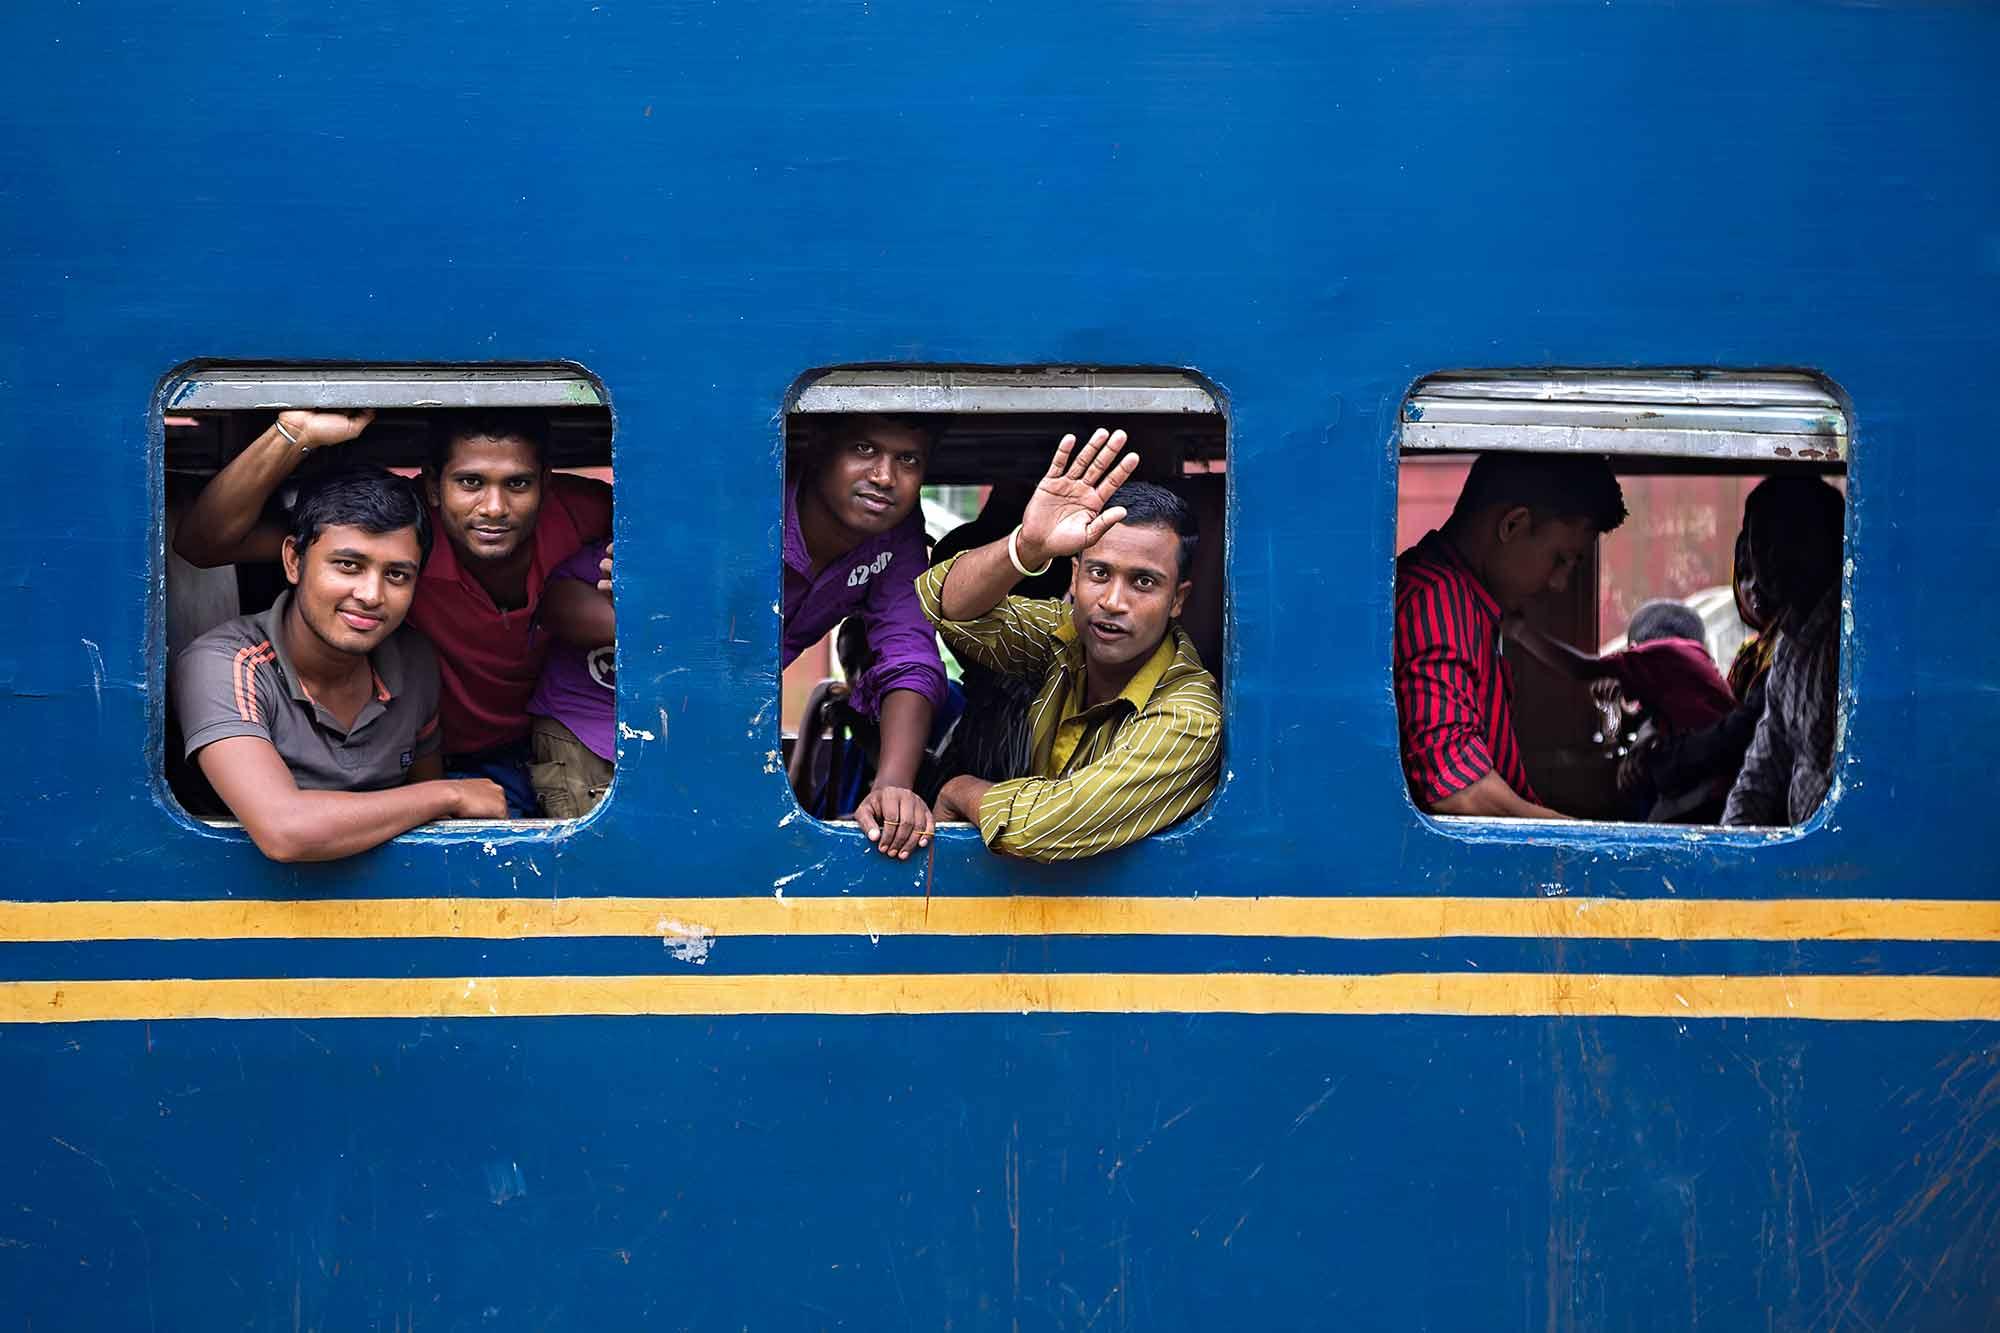 Train travelling Bangladesh. © Ulli Maier & Nisa Maier